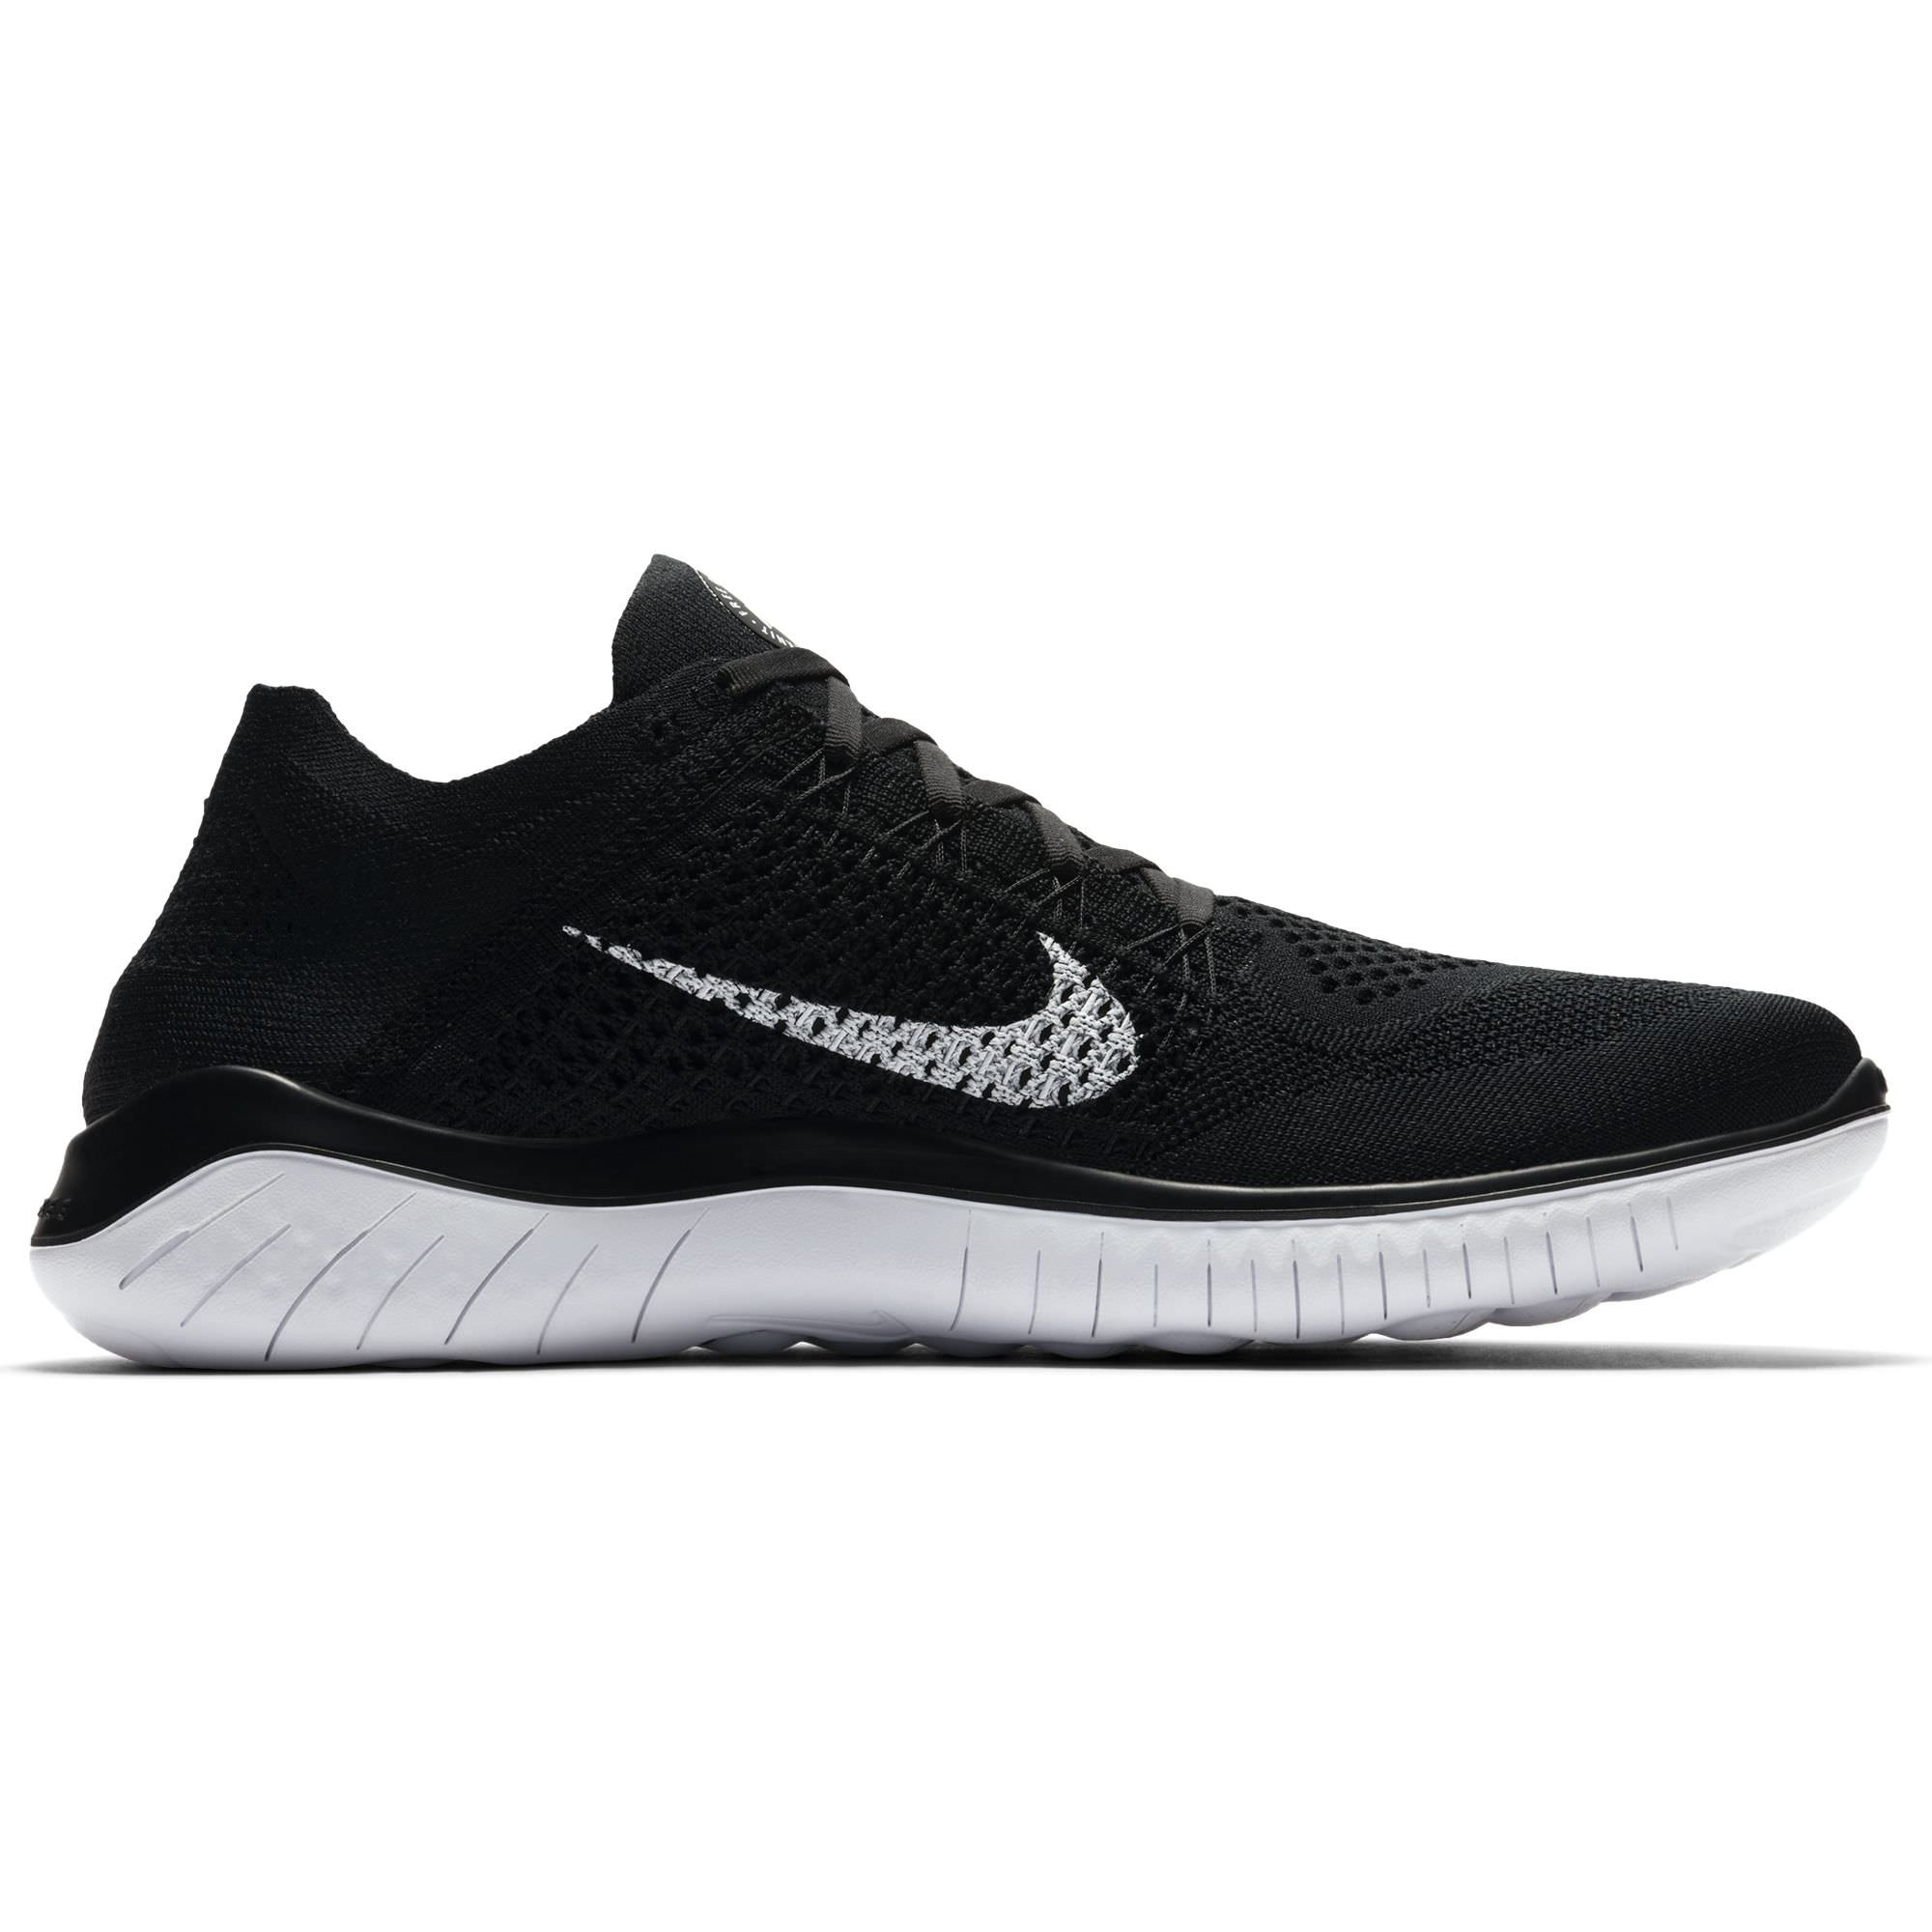 23b2b1f68a967 Galleon - Nike 942838-001  Mens Free Run Black White Running Sneakers (9.5  D(M) US Men)